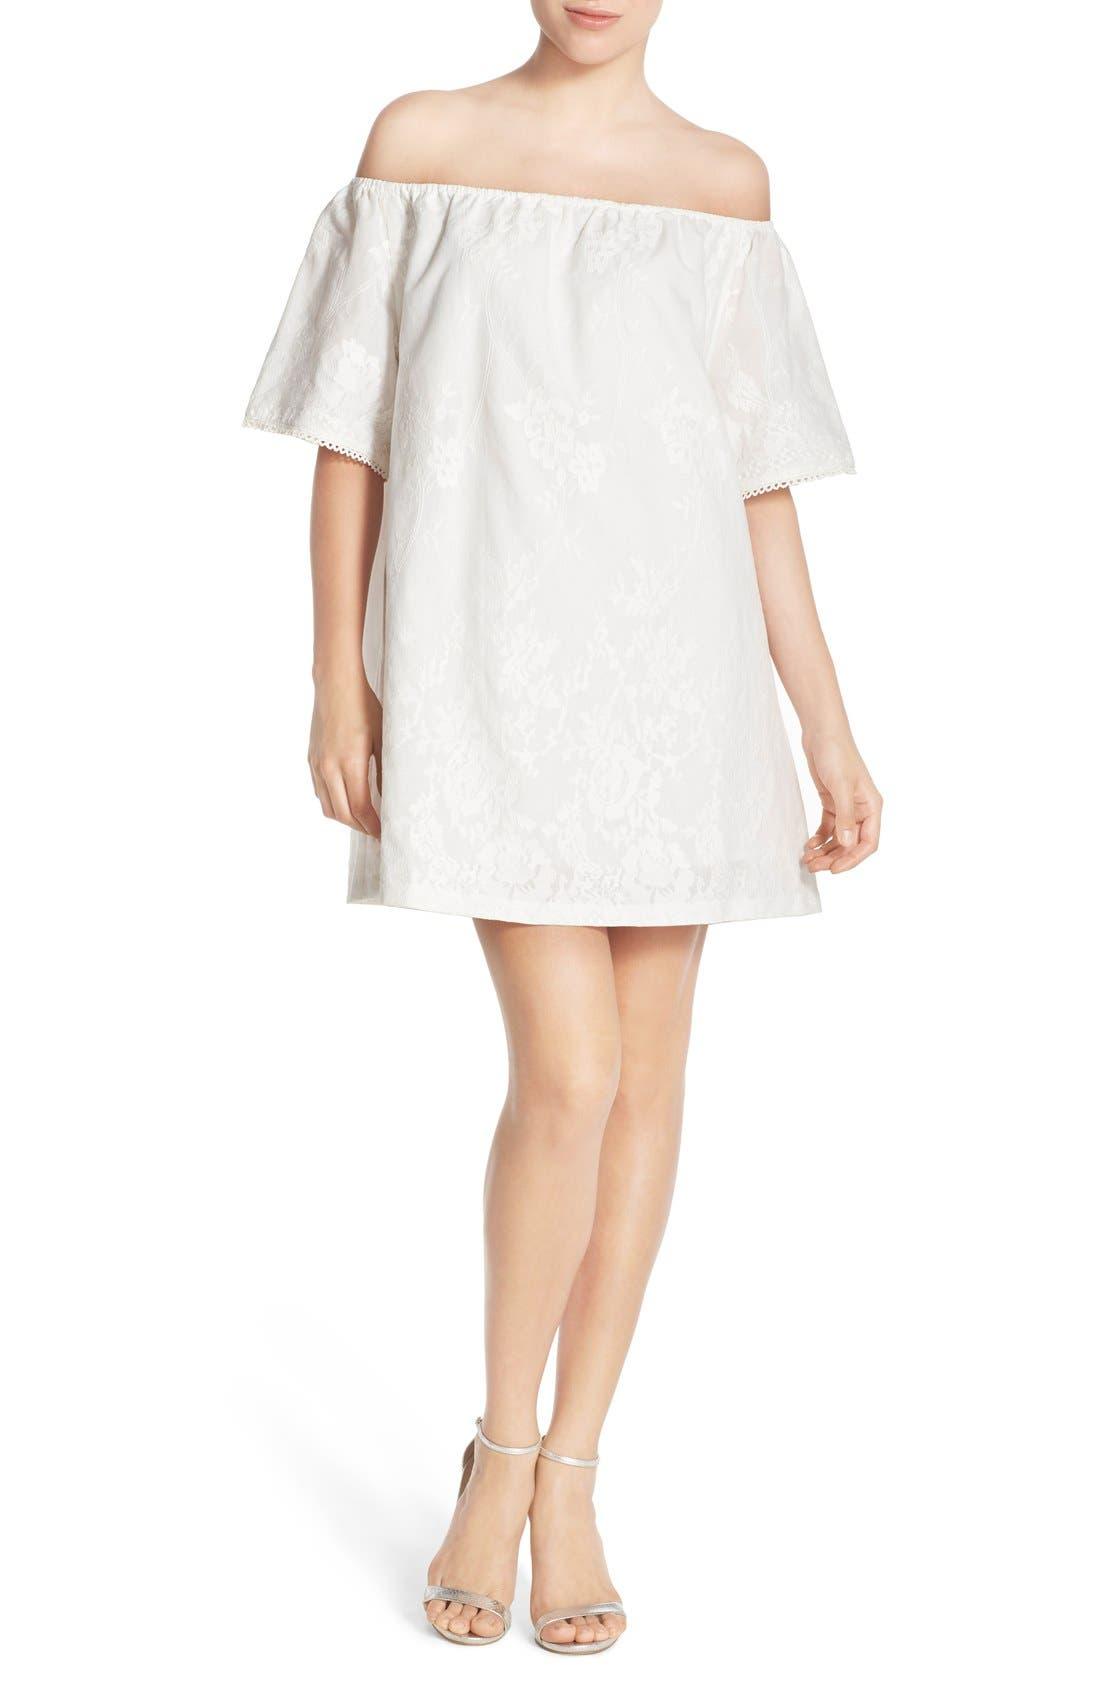 Alternate Image 1 Selected - BB Dakota 'Manda' Off the Shoulder Cotton Shift Dress